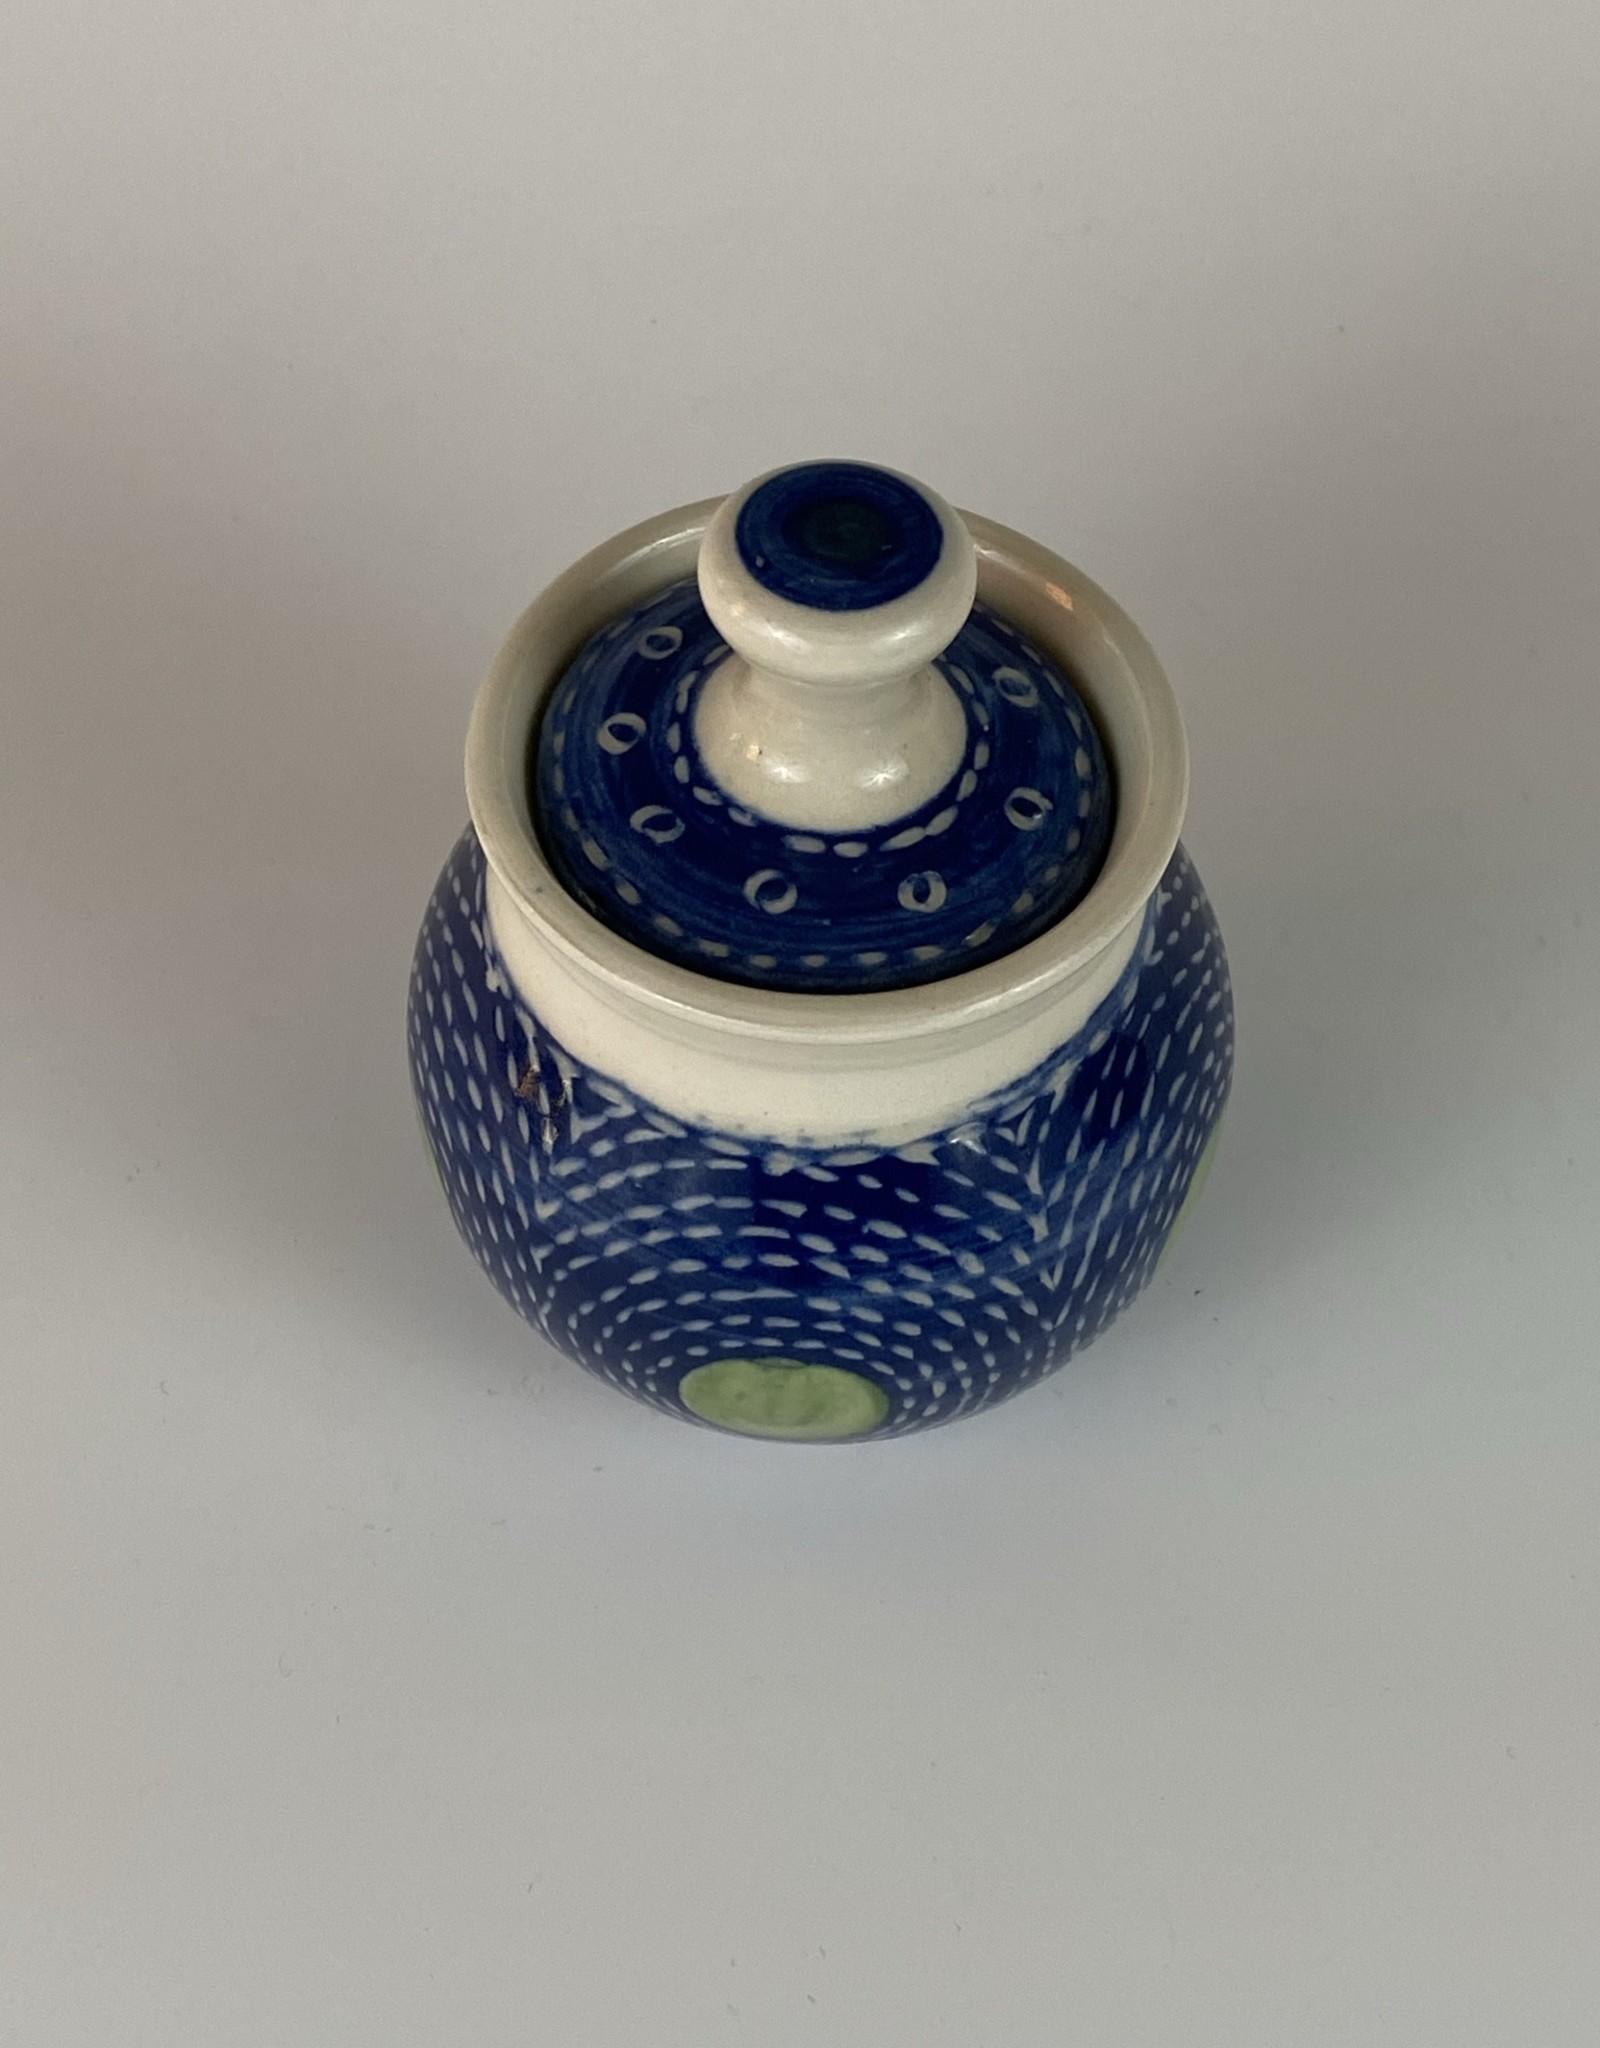 Anshula Tayal Amaati lidded jar blue Kantha